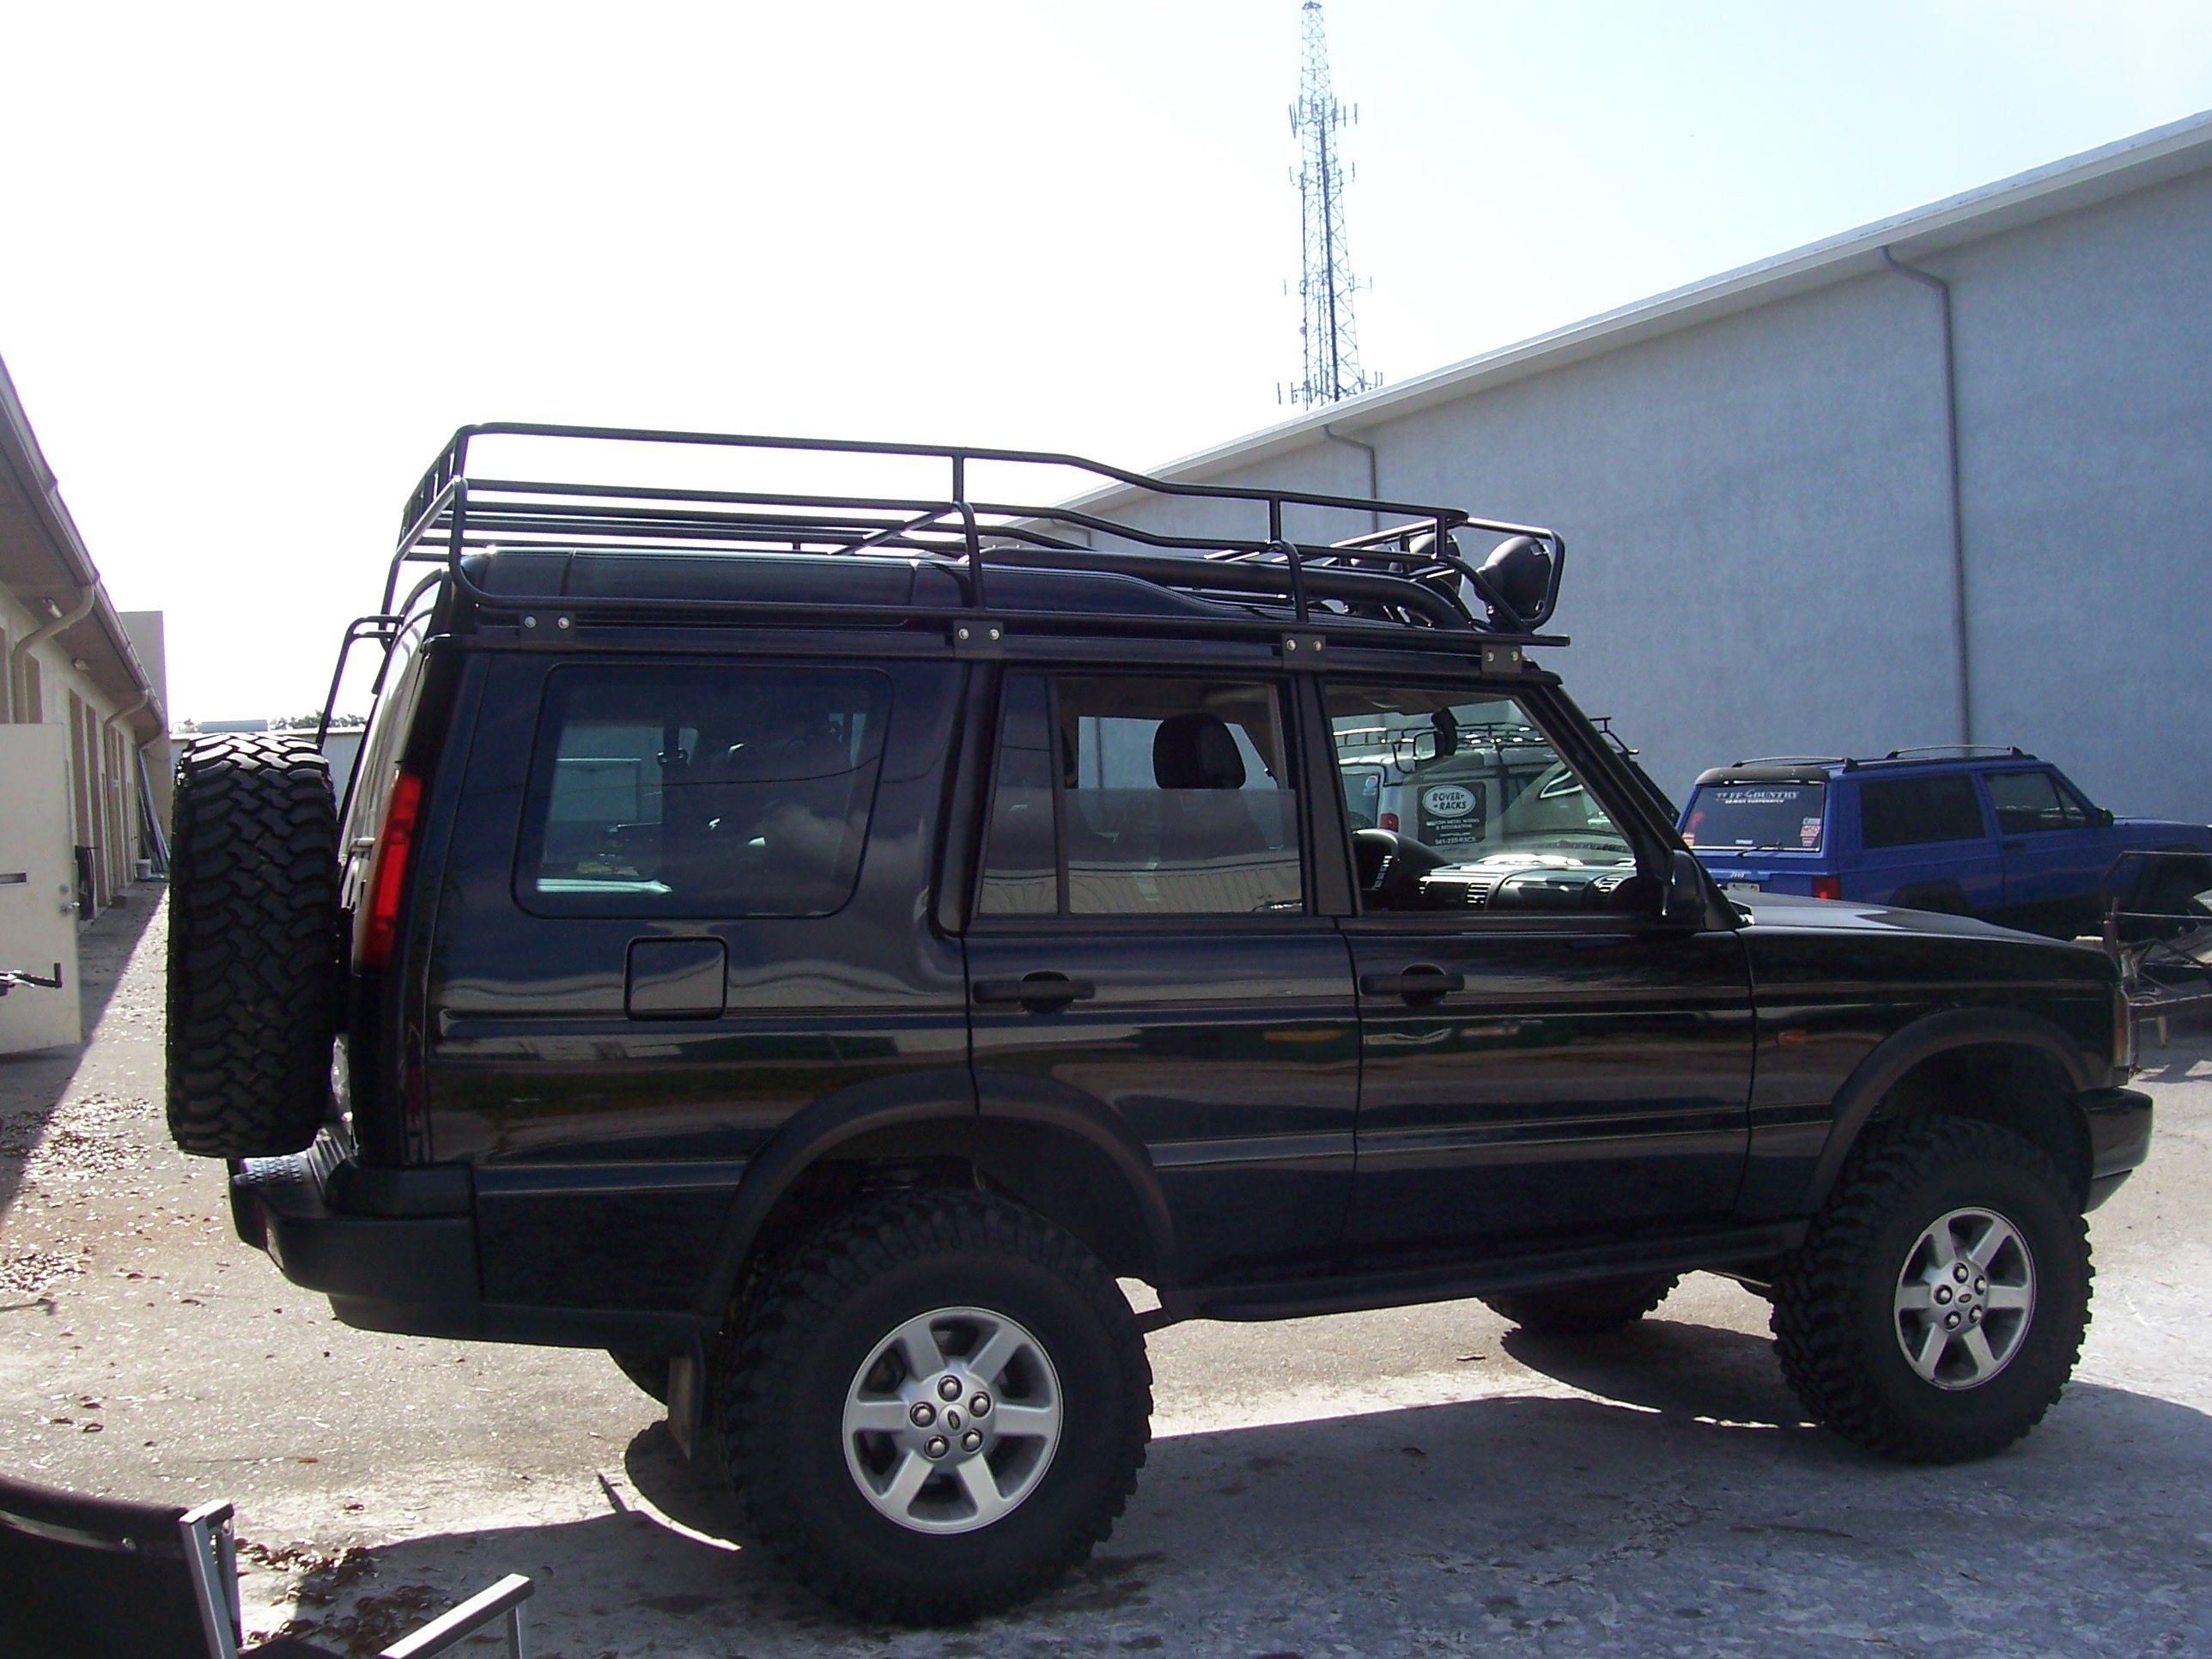 Voyager Safari Rack Land Rover Discovery Rover Discovery Land Rover Discovery 2